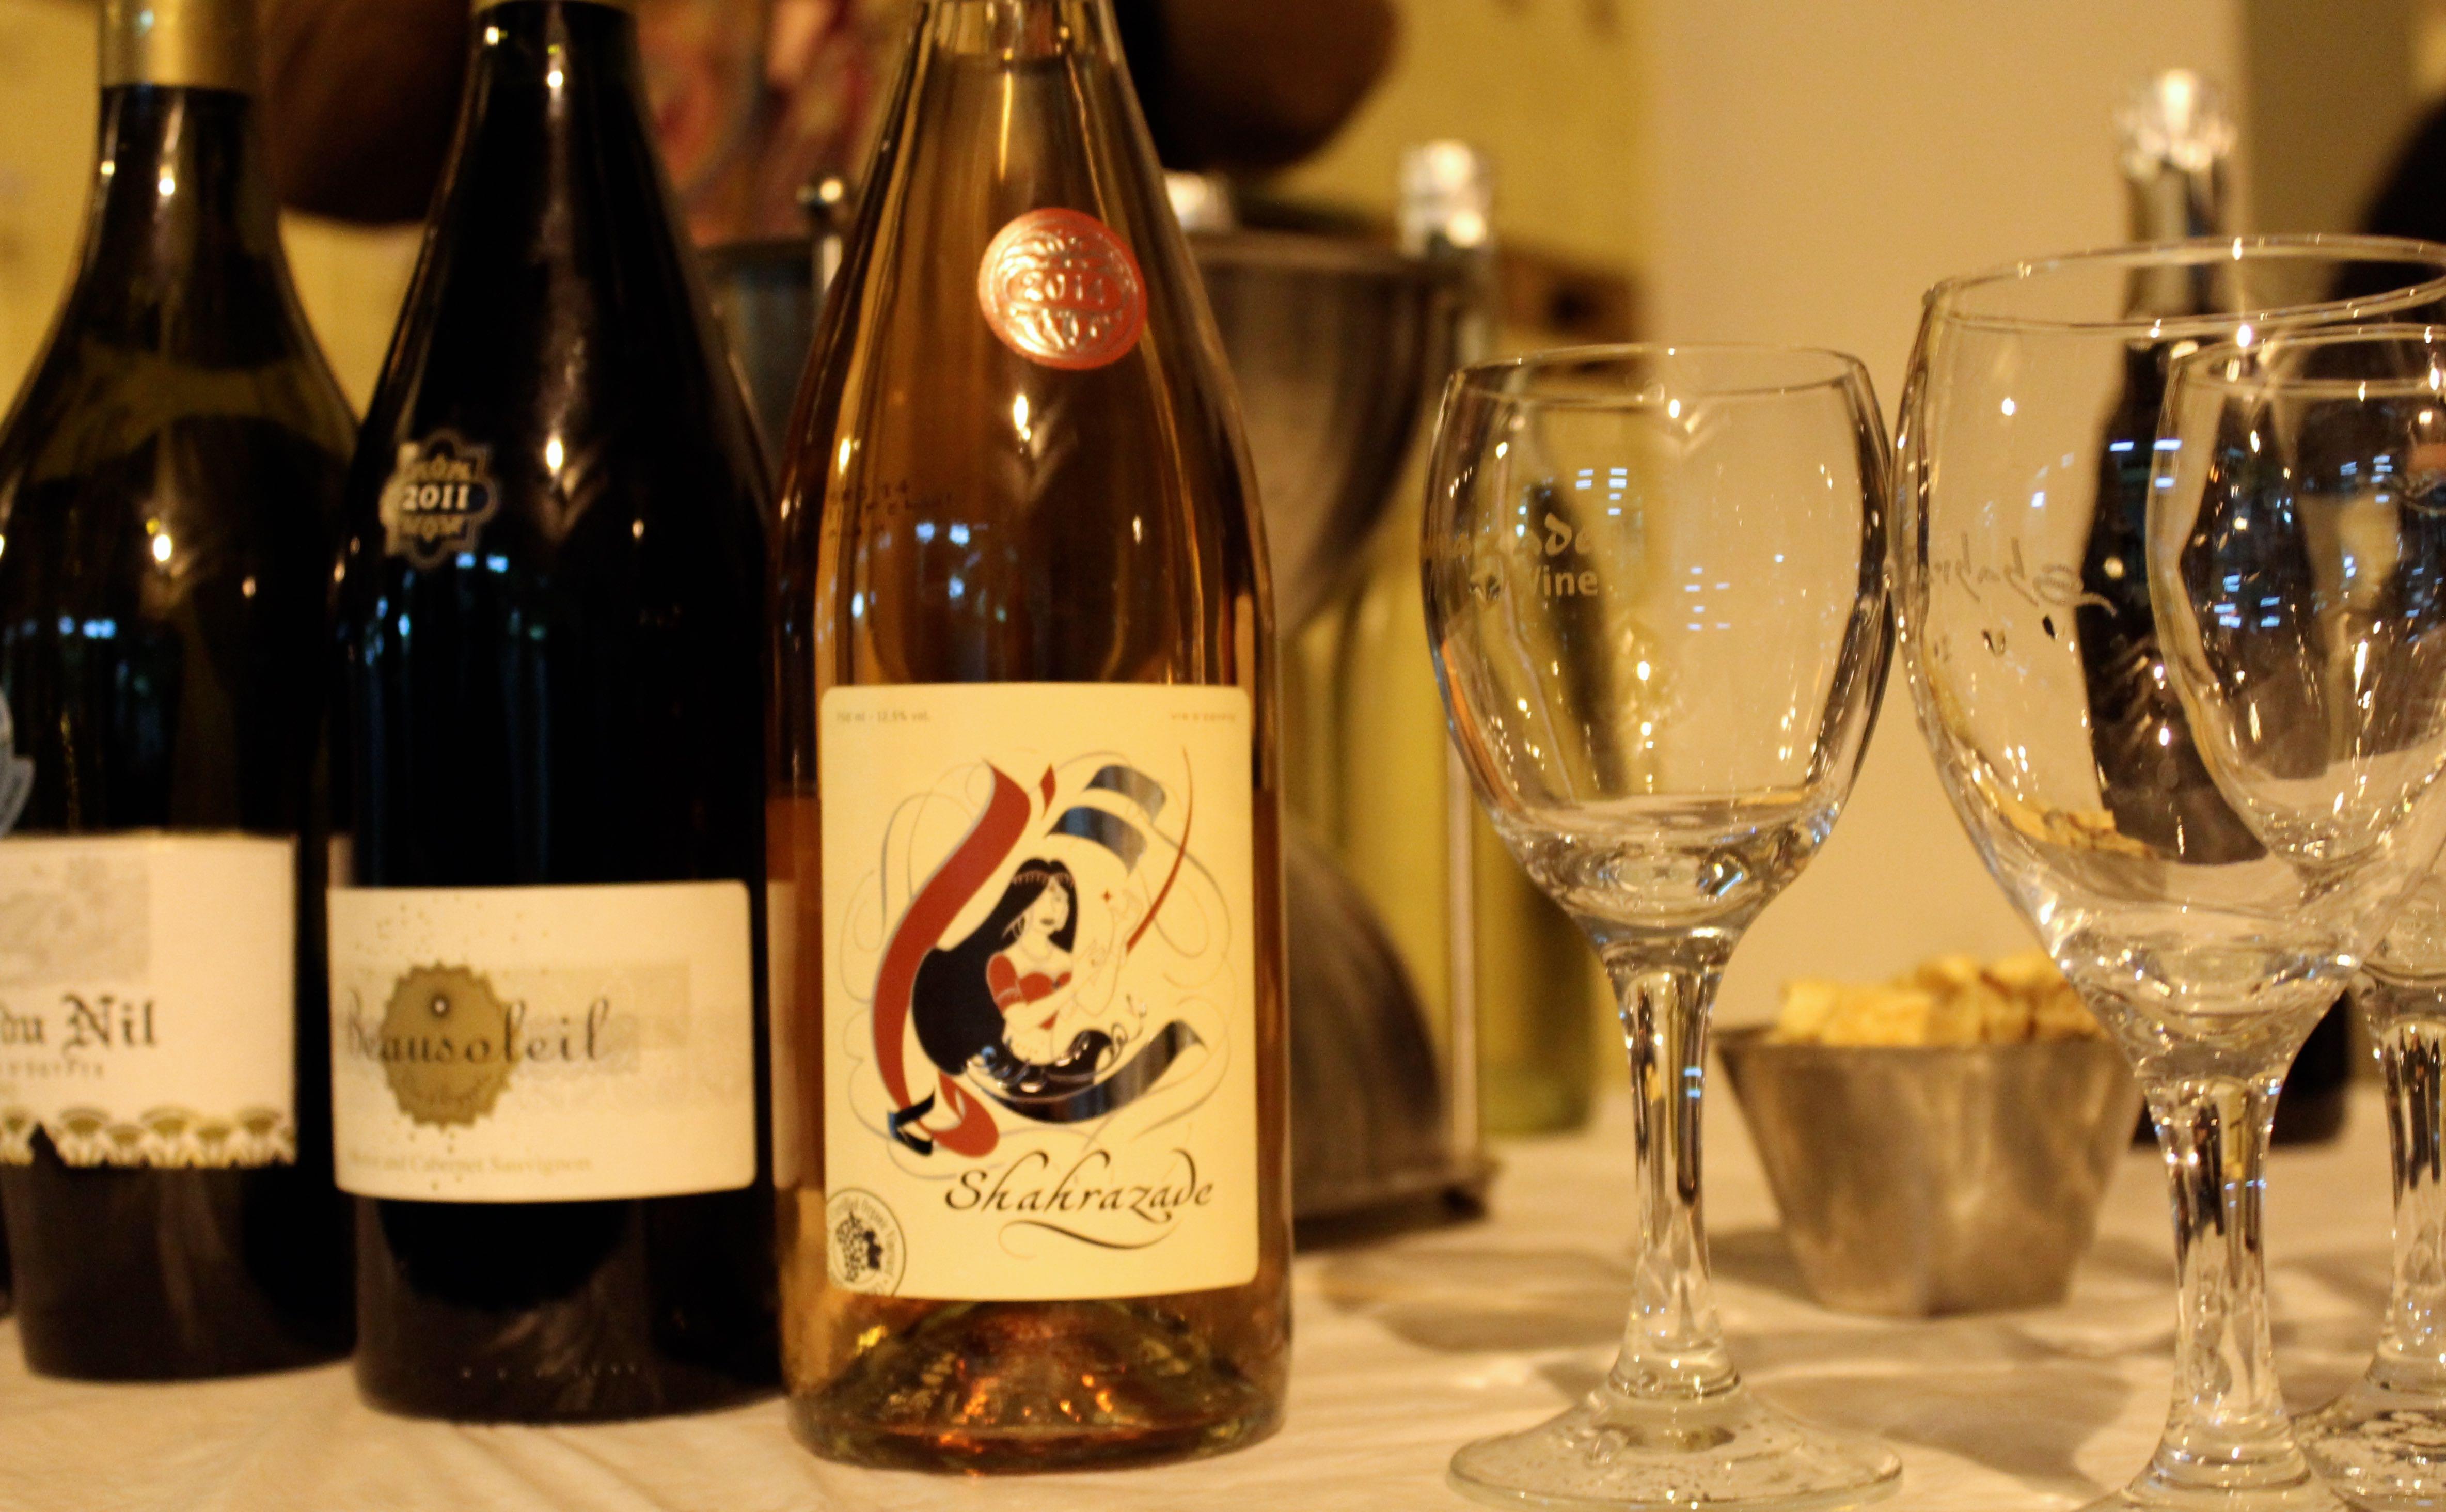 el gouna_egypt_kouroum of the nile winery_wine_midnight blue elephant